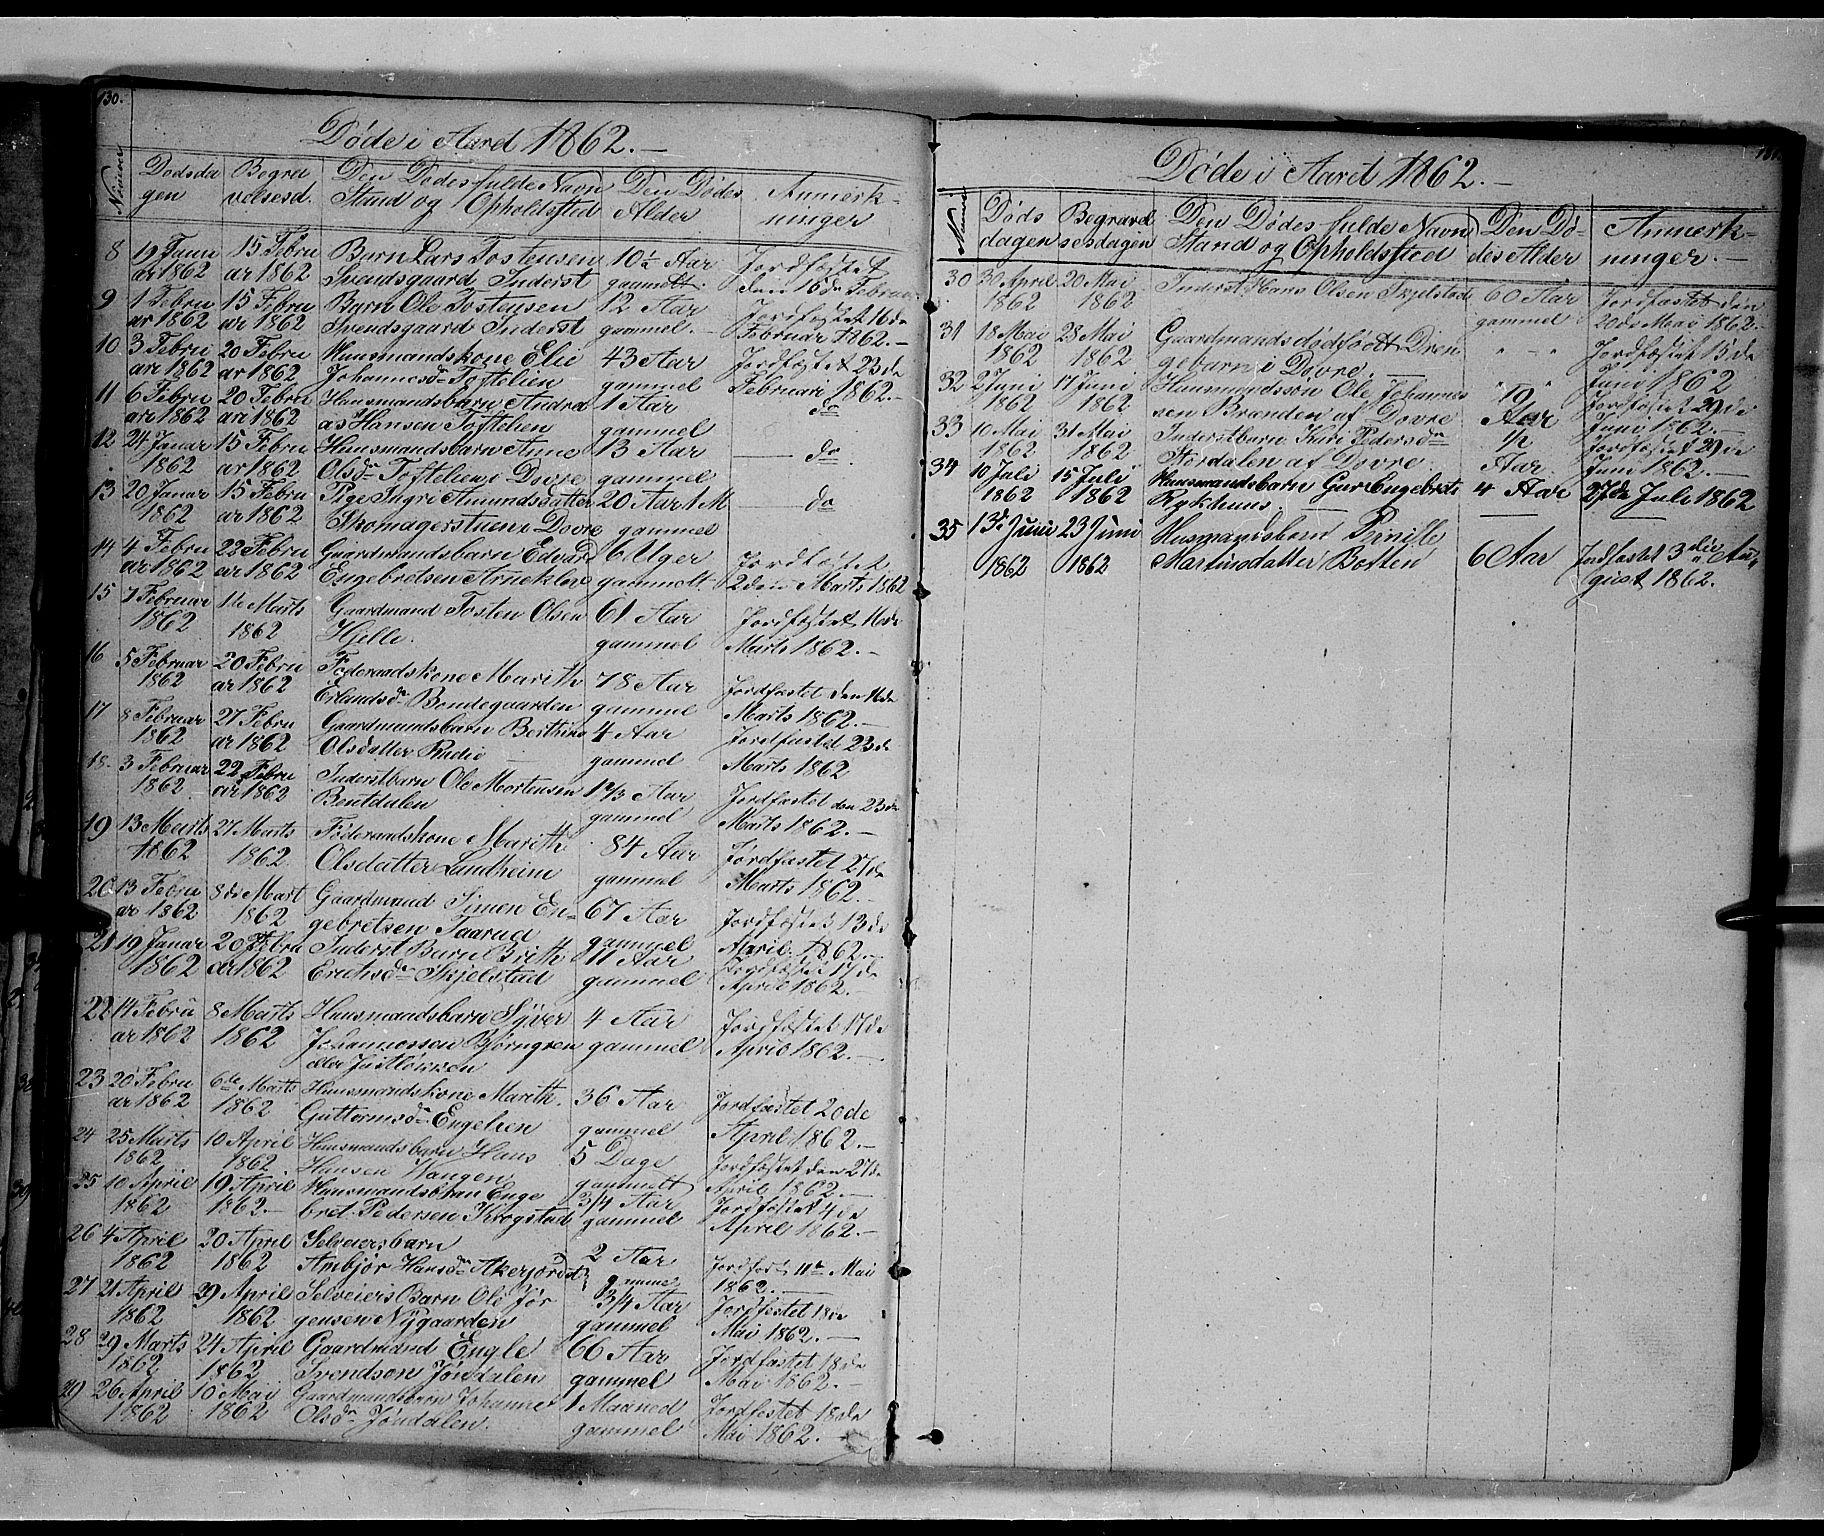 SAH, Lesja prestekontor, Klokkerbok nr. 3, 1842-1862, s. 130-131